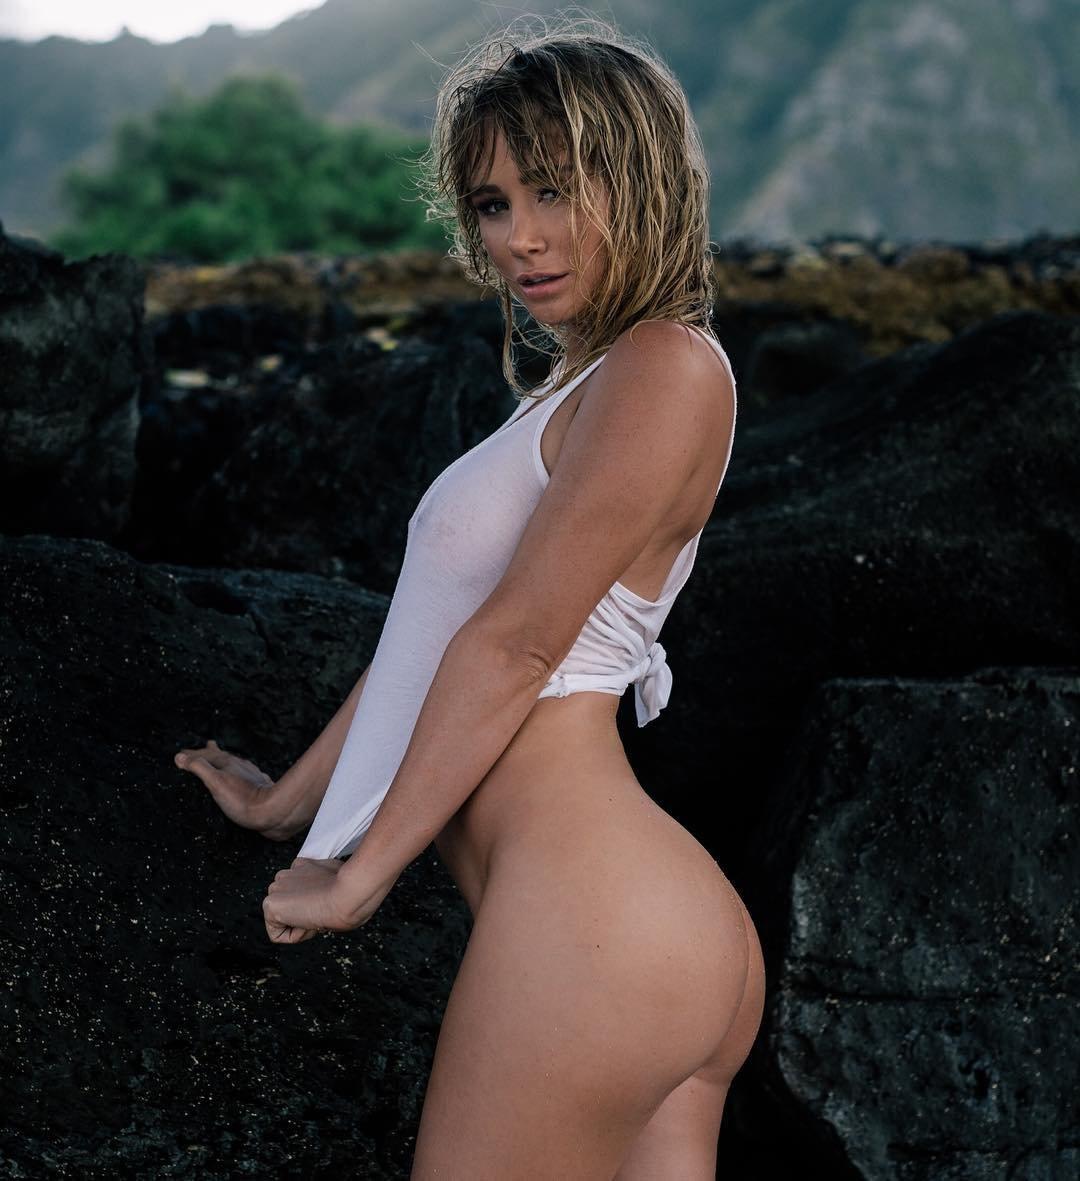 Sarah jean underwood vidéos nues